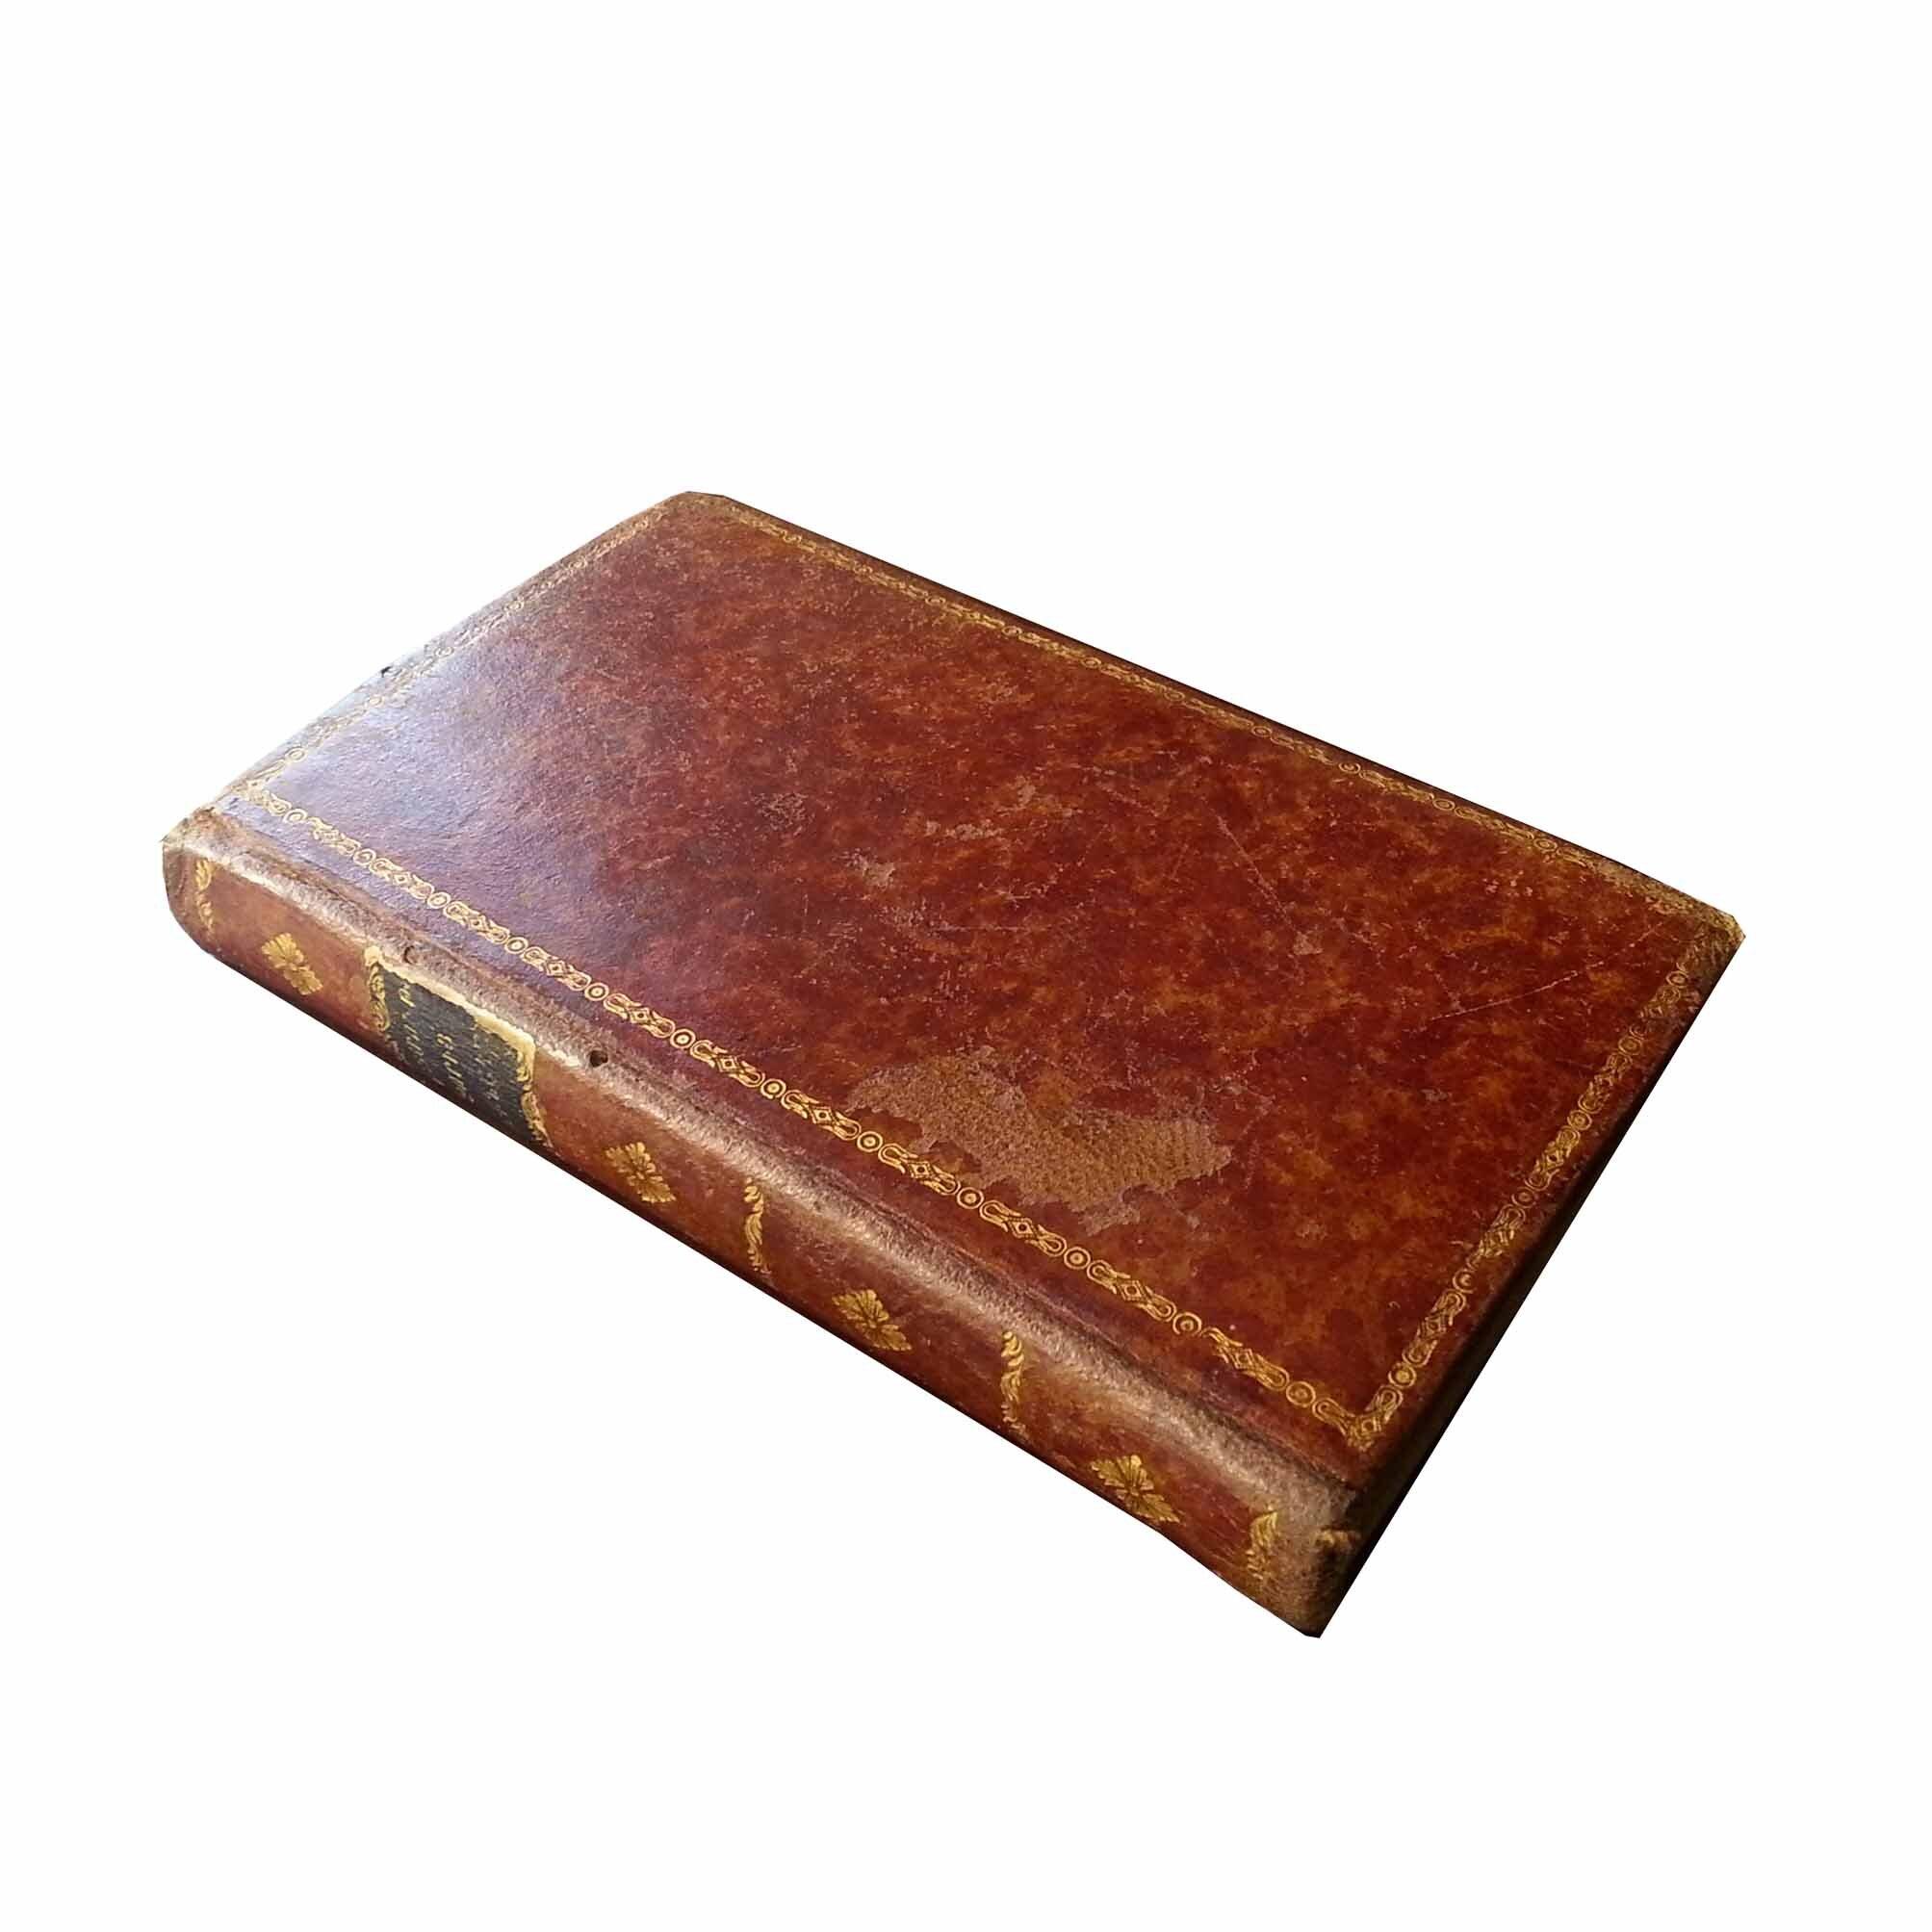 5024 Setean Bible History 1848 Calf Binding Front Spine free N